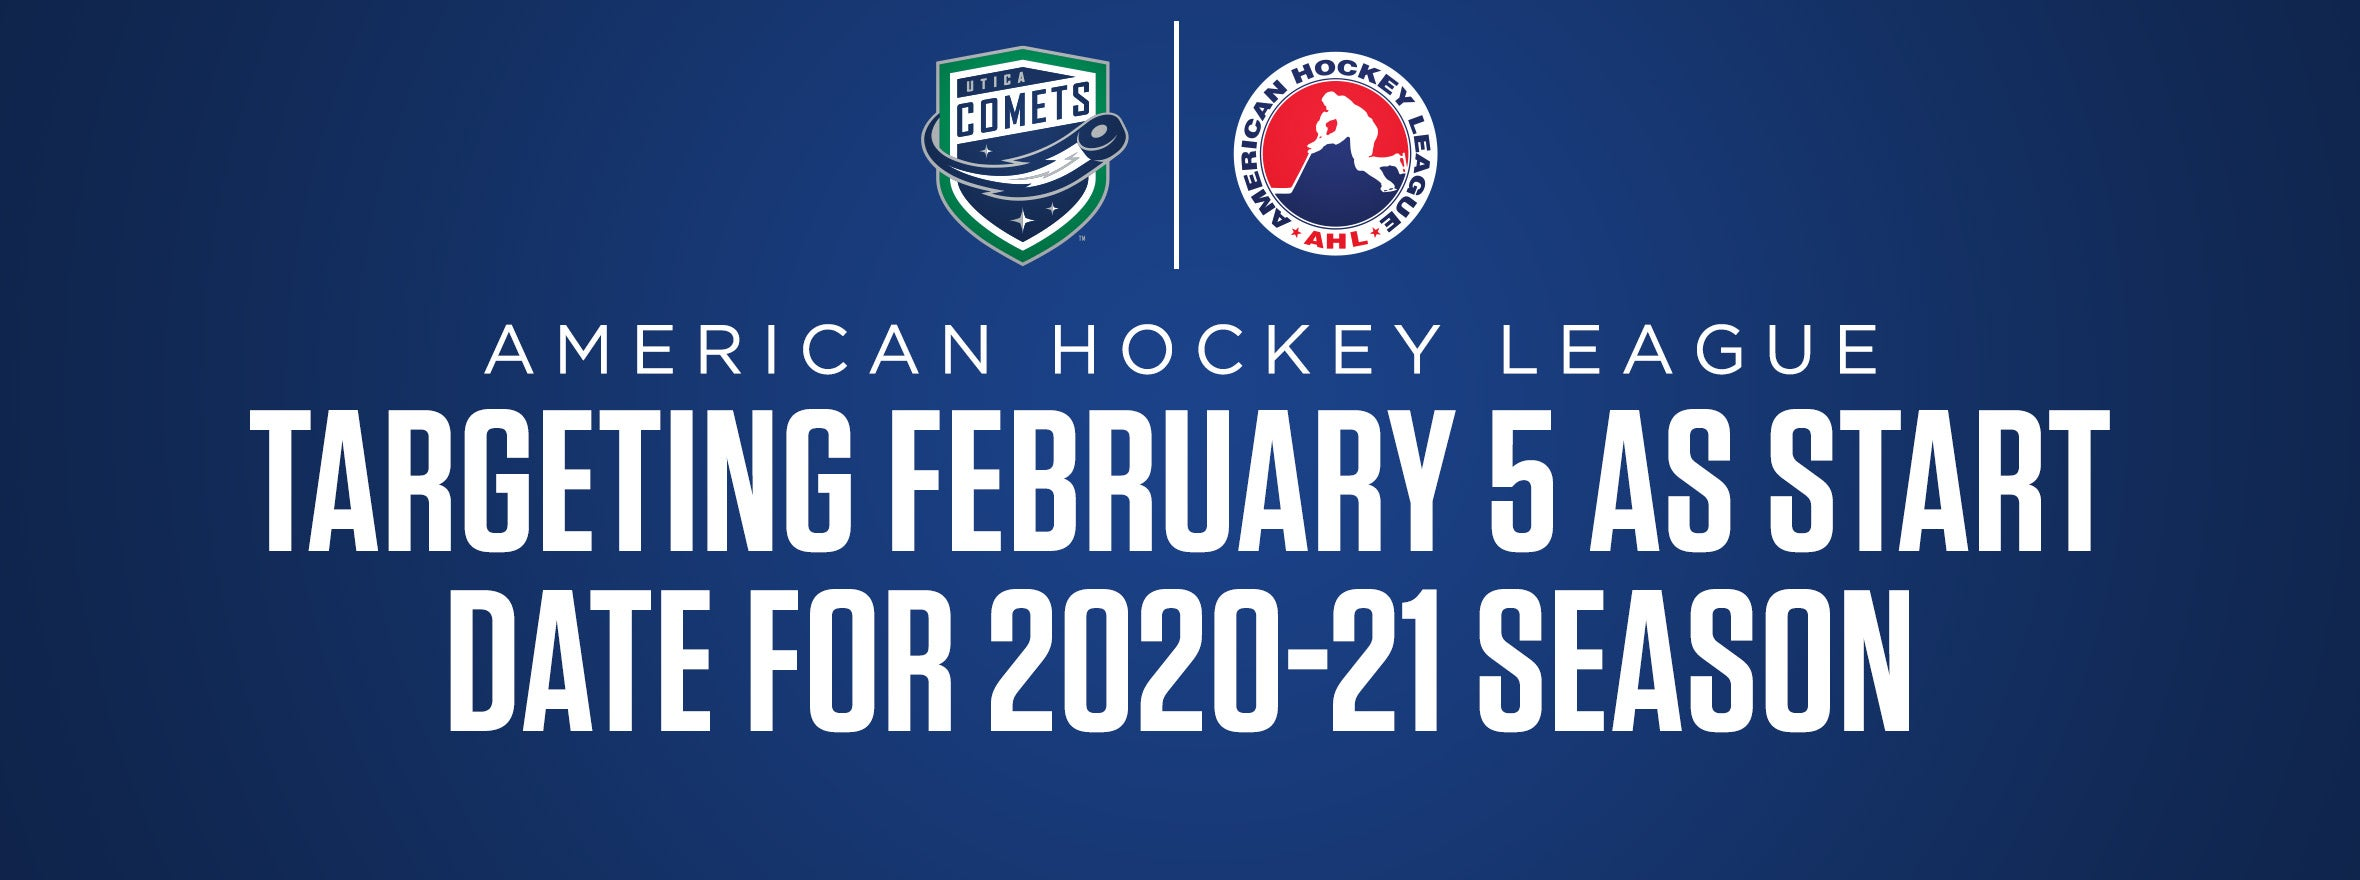 AHL TARGETING FEBRUARY 5 AS START DATE FOR 2020-21 SEASON